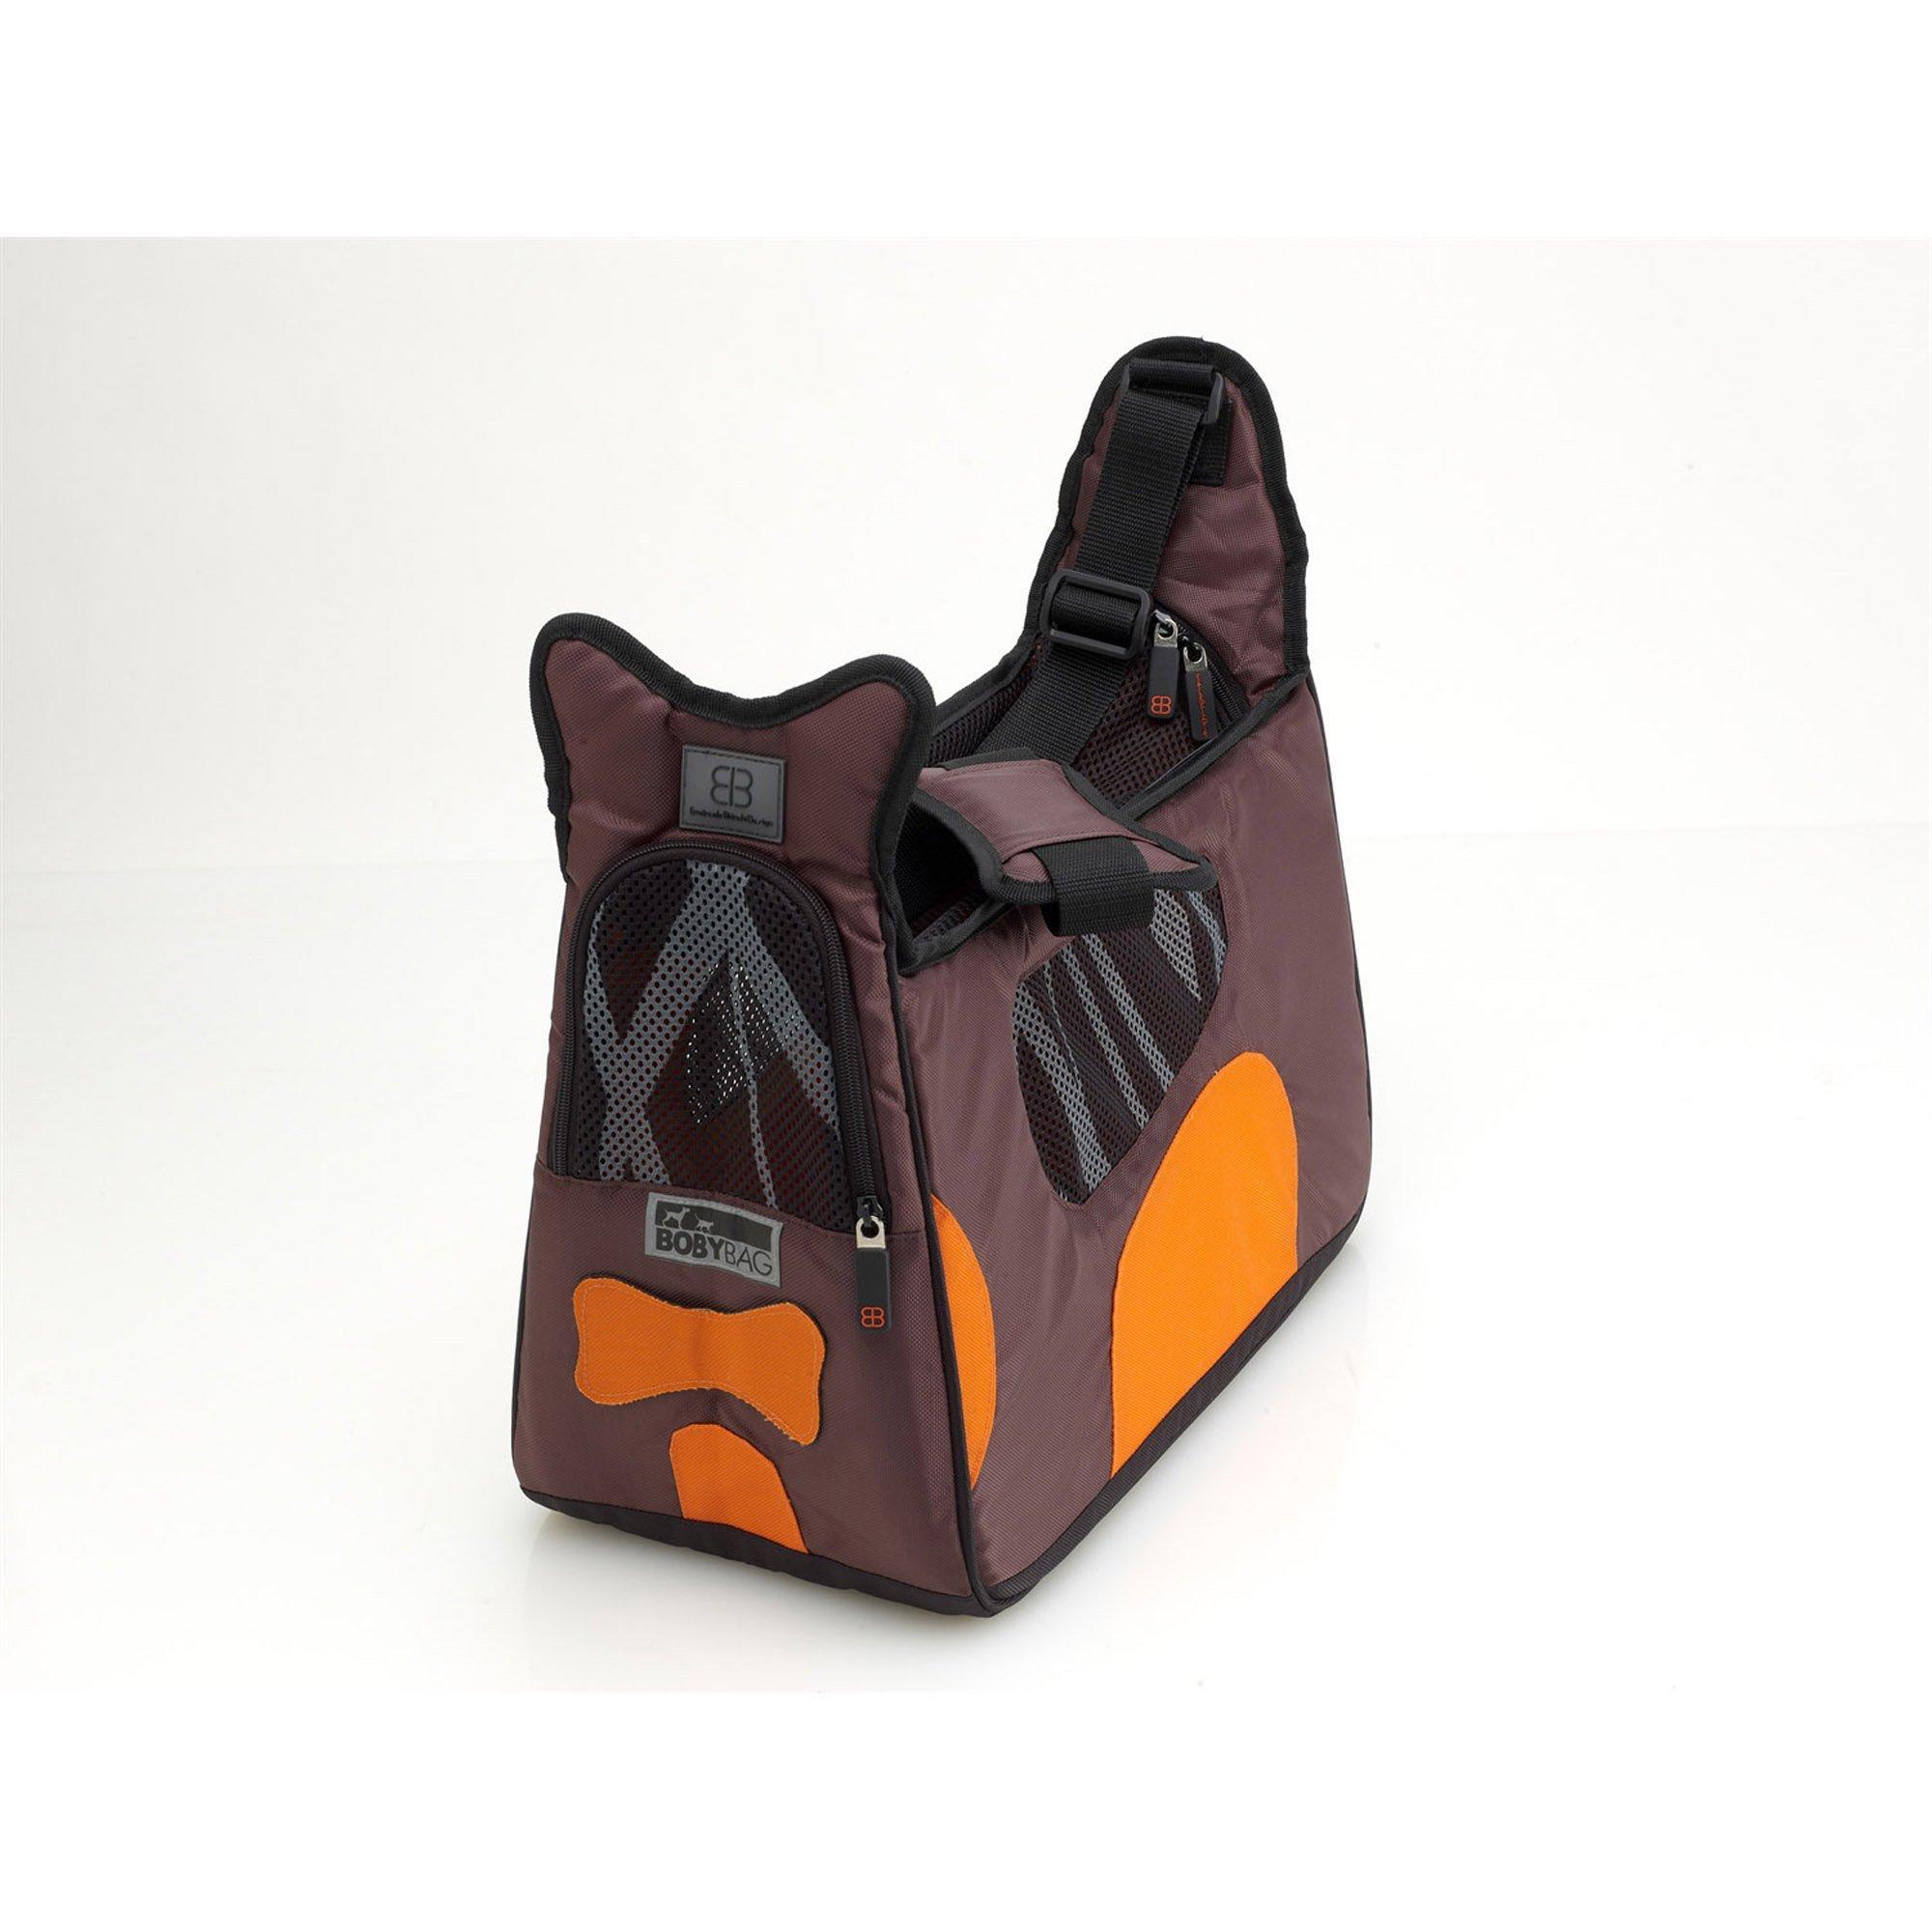 Pet Ego Boby Bag Forma Frame Pet Carriers in Brown & Orange